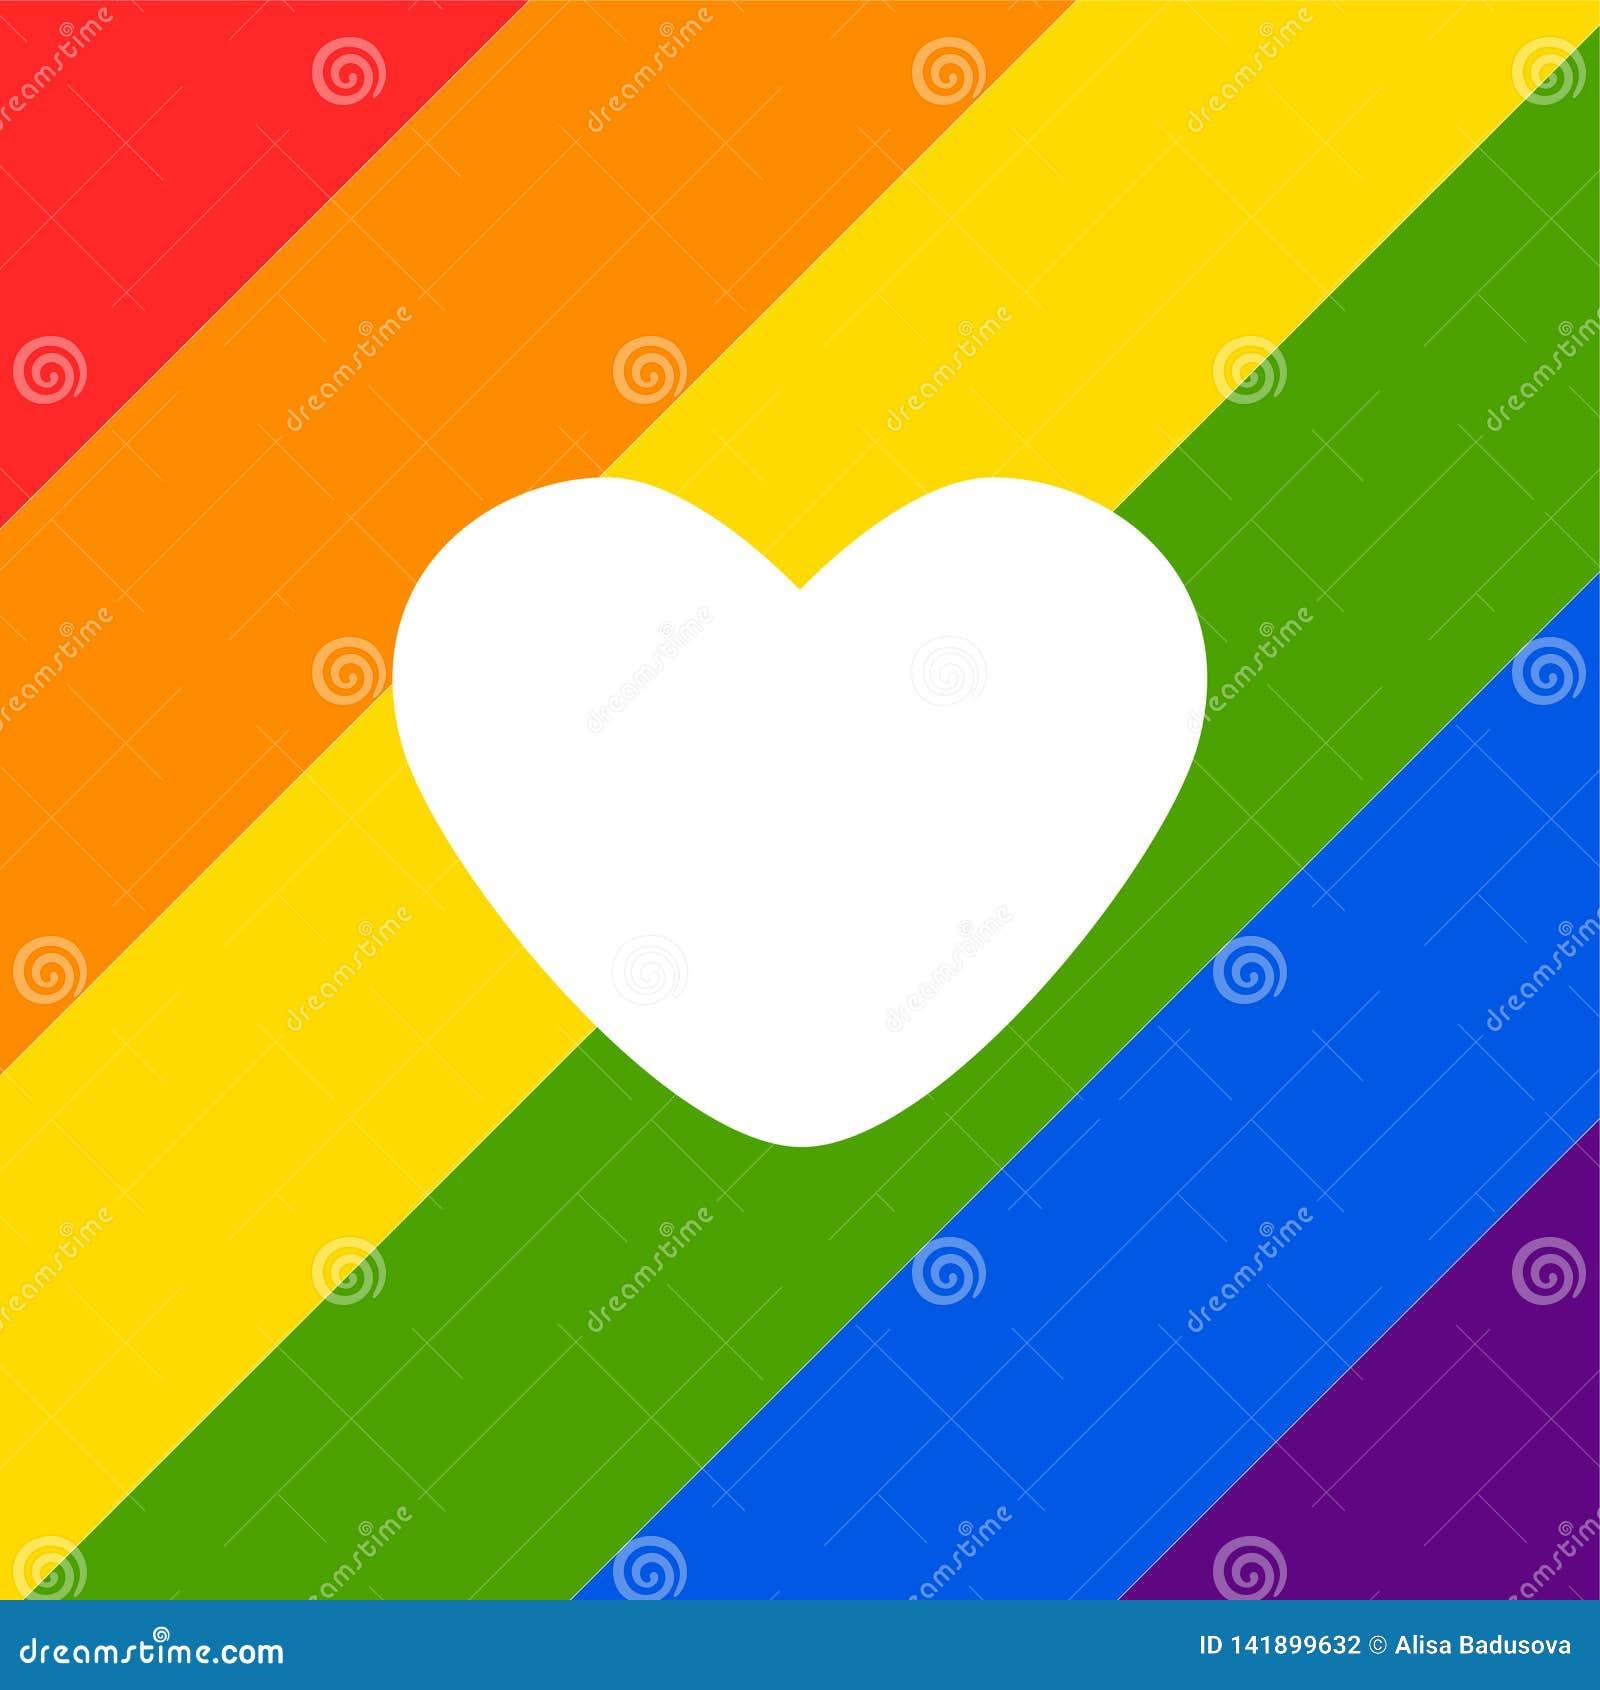 Vector abstract doodles pattern. Hand drawn heart pride, love, peace with rainbow. Gay parade slogan. LGBT rights symbol